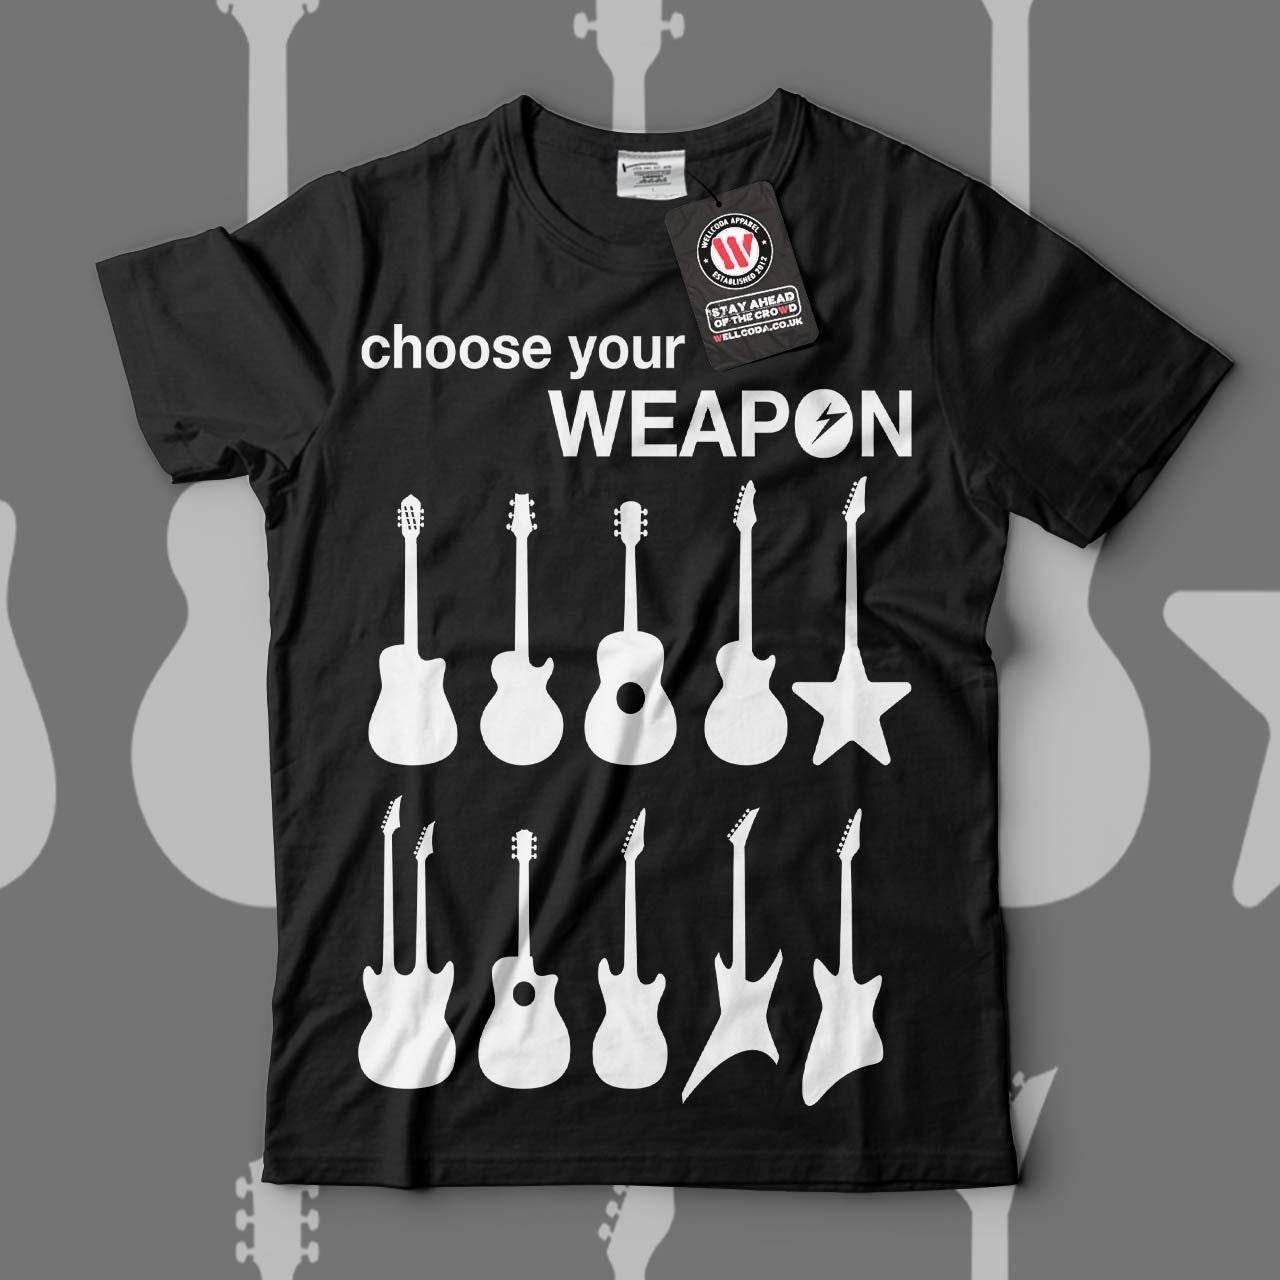 Instrument Artwork Guitar Music Men Black White Grey Red Royal Blue Tshirt S5XL NEW  Wellcoda y833